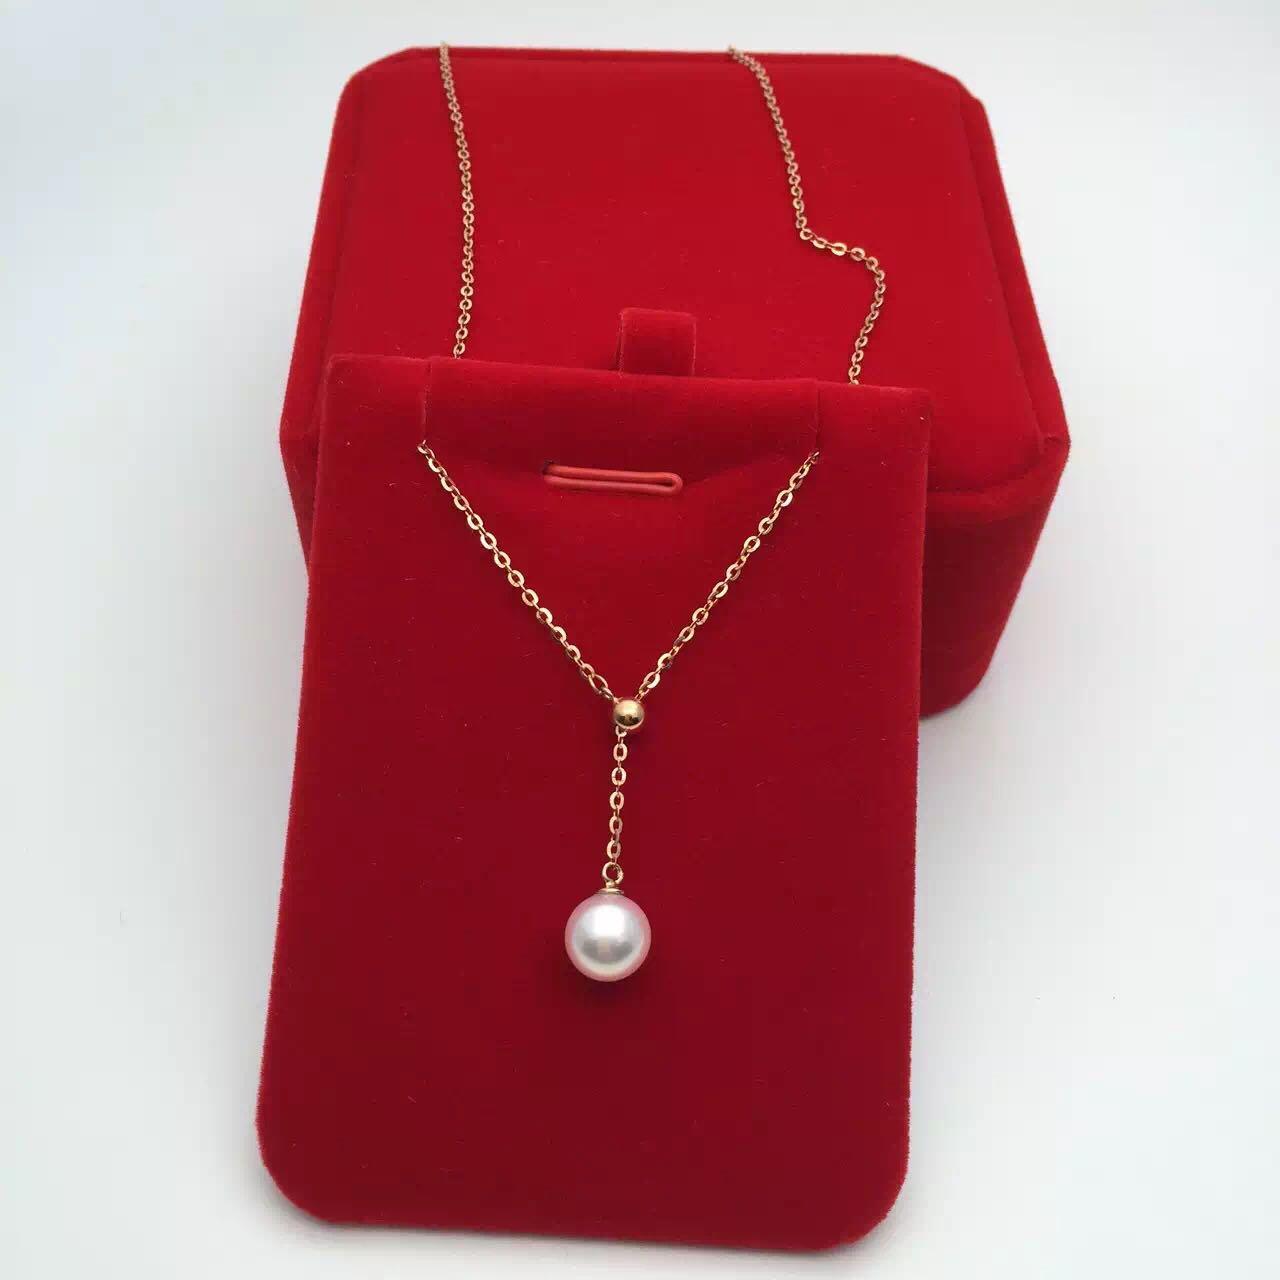 18K钻石翡翠彩宝珊瑚珍珠碧玺蓝珀戒指吊坠手链镶嵌首饰加工定制